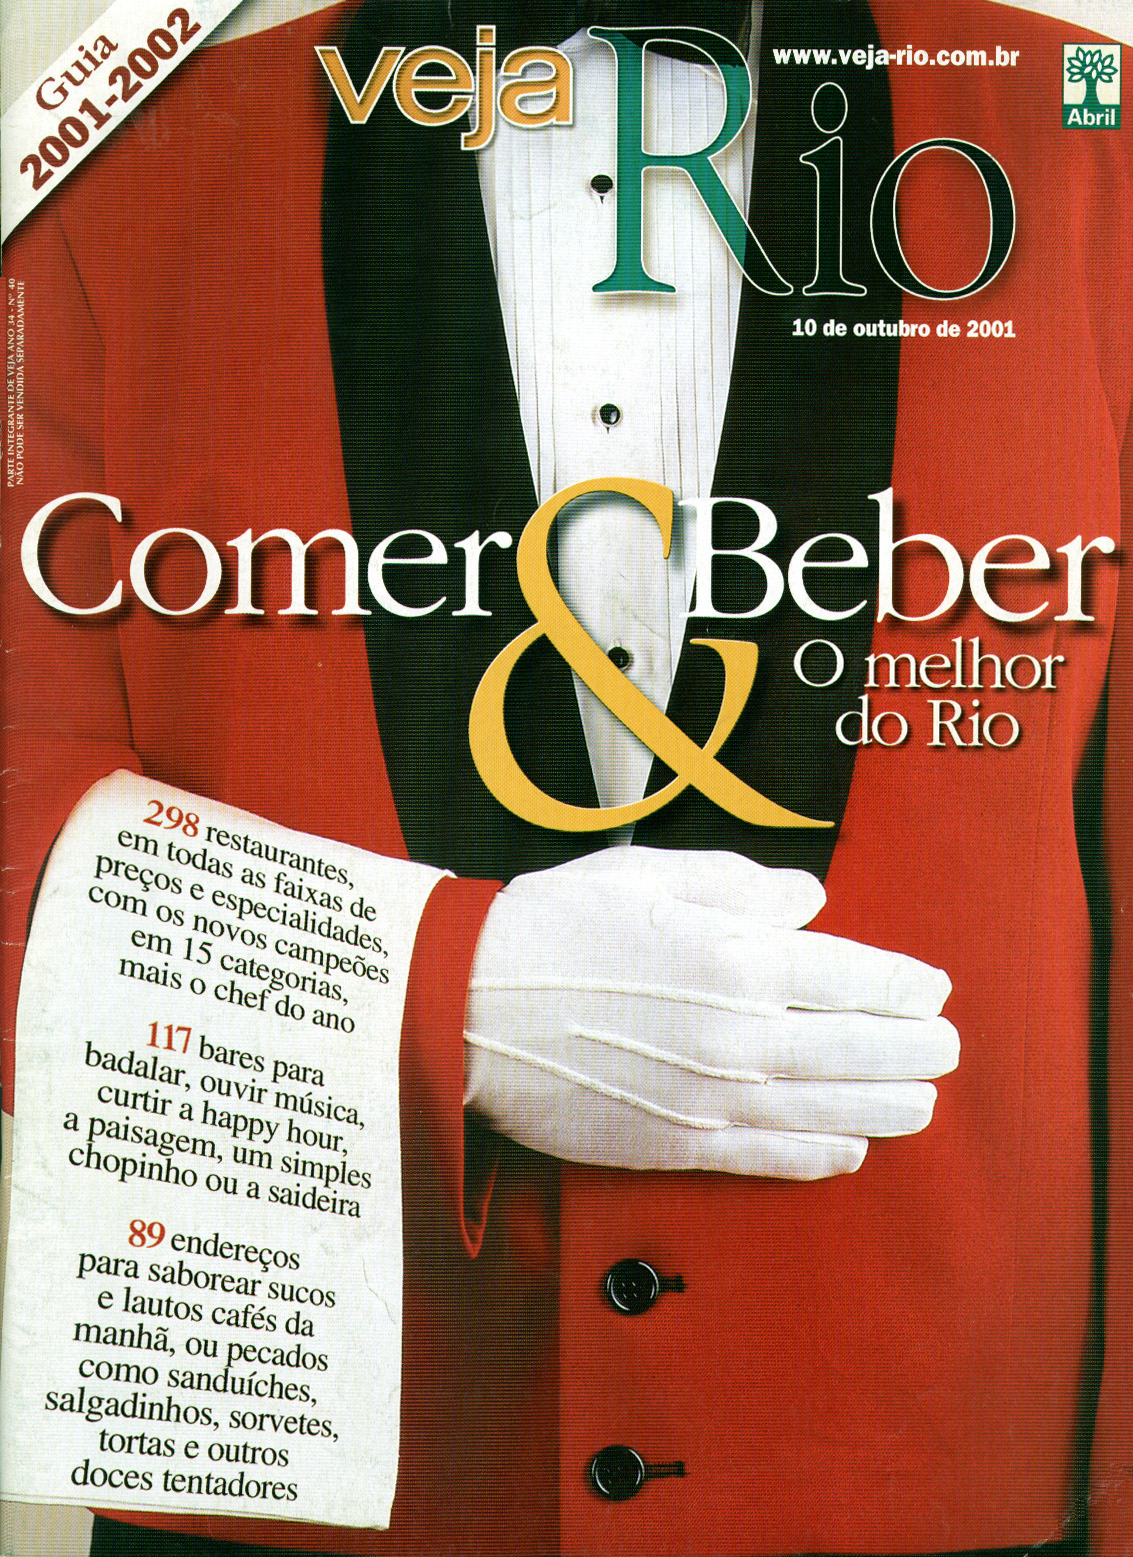 Capa da revista Veja Rio Especial Comer & Beber, de 10 de outubro de 2001